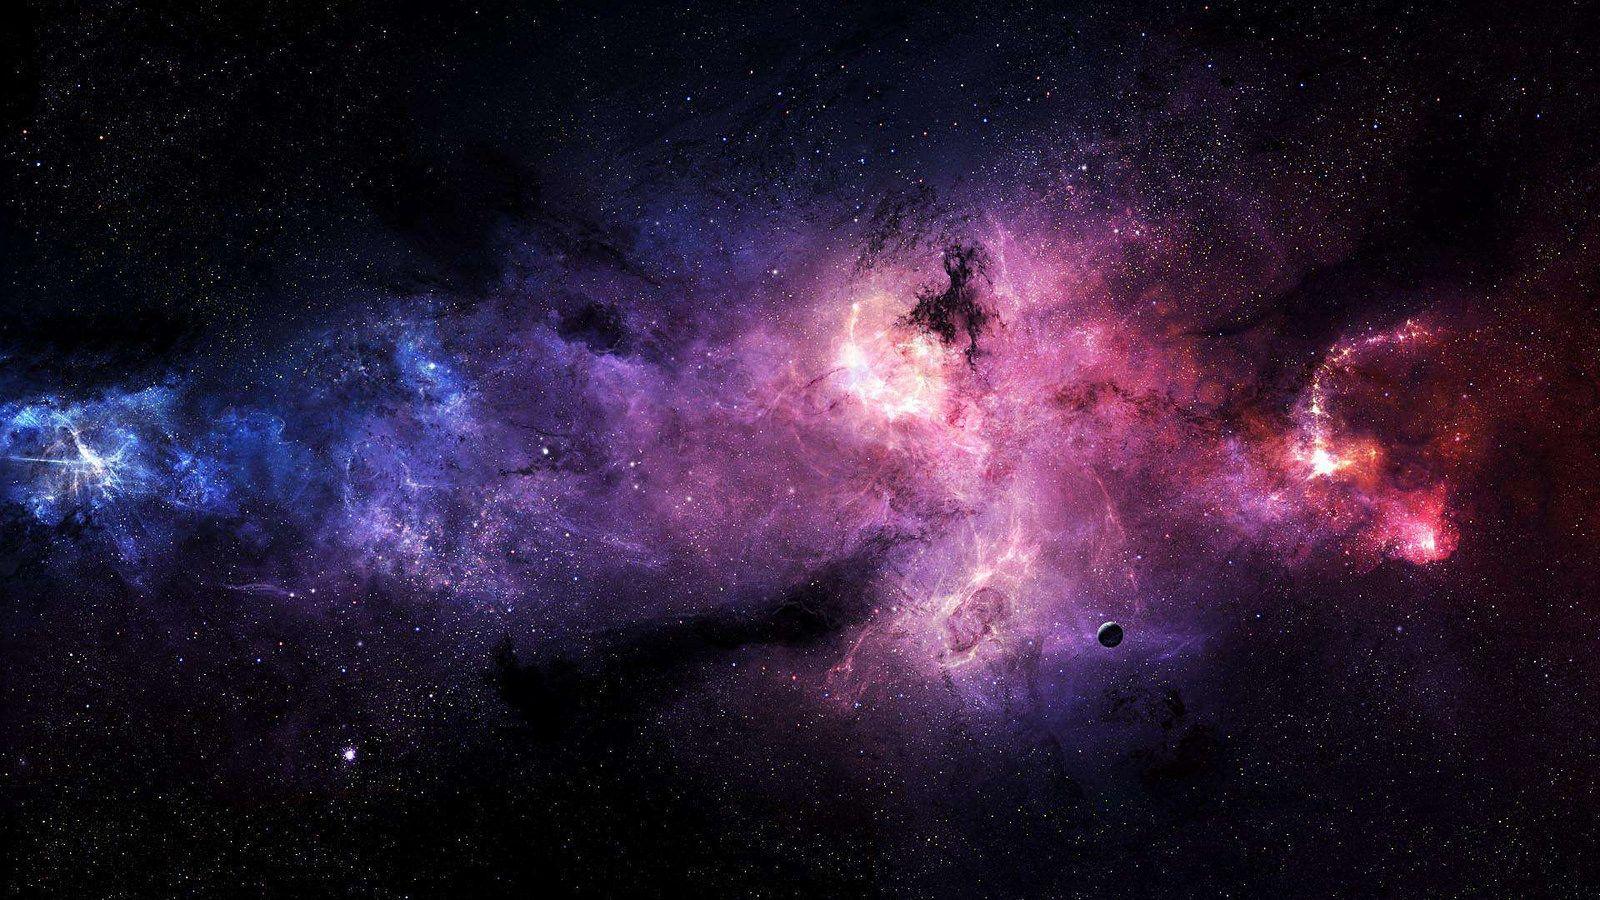 Best Wallpapers Hd Free Cell Phone Wallpaper Images Nebula Wallpaper Purple Galaxy Wallpaper Wallpaper Space